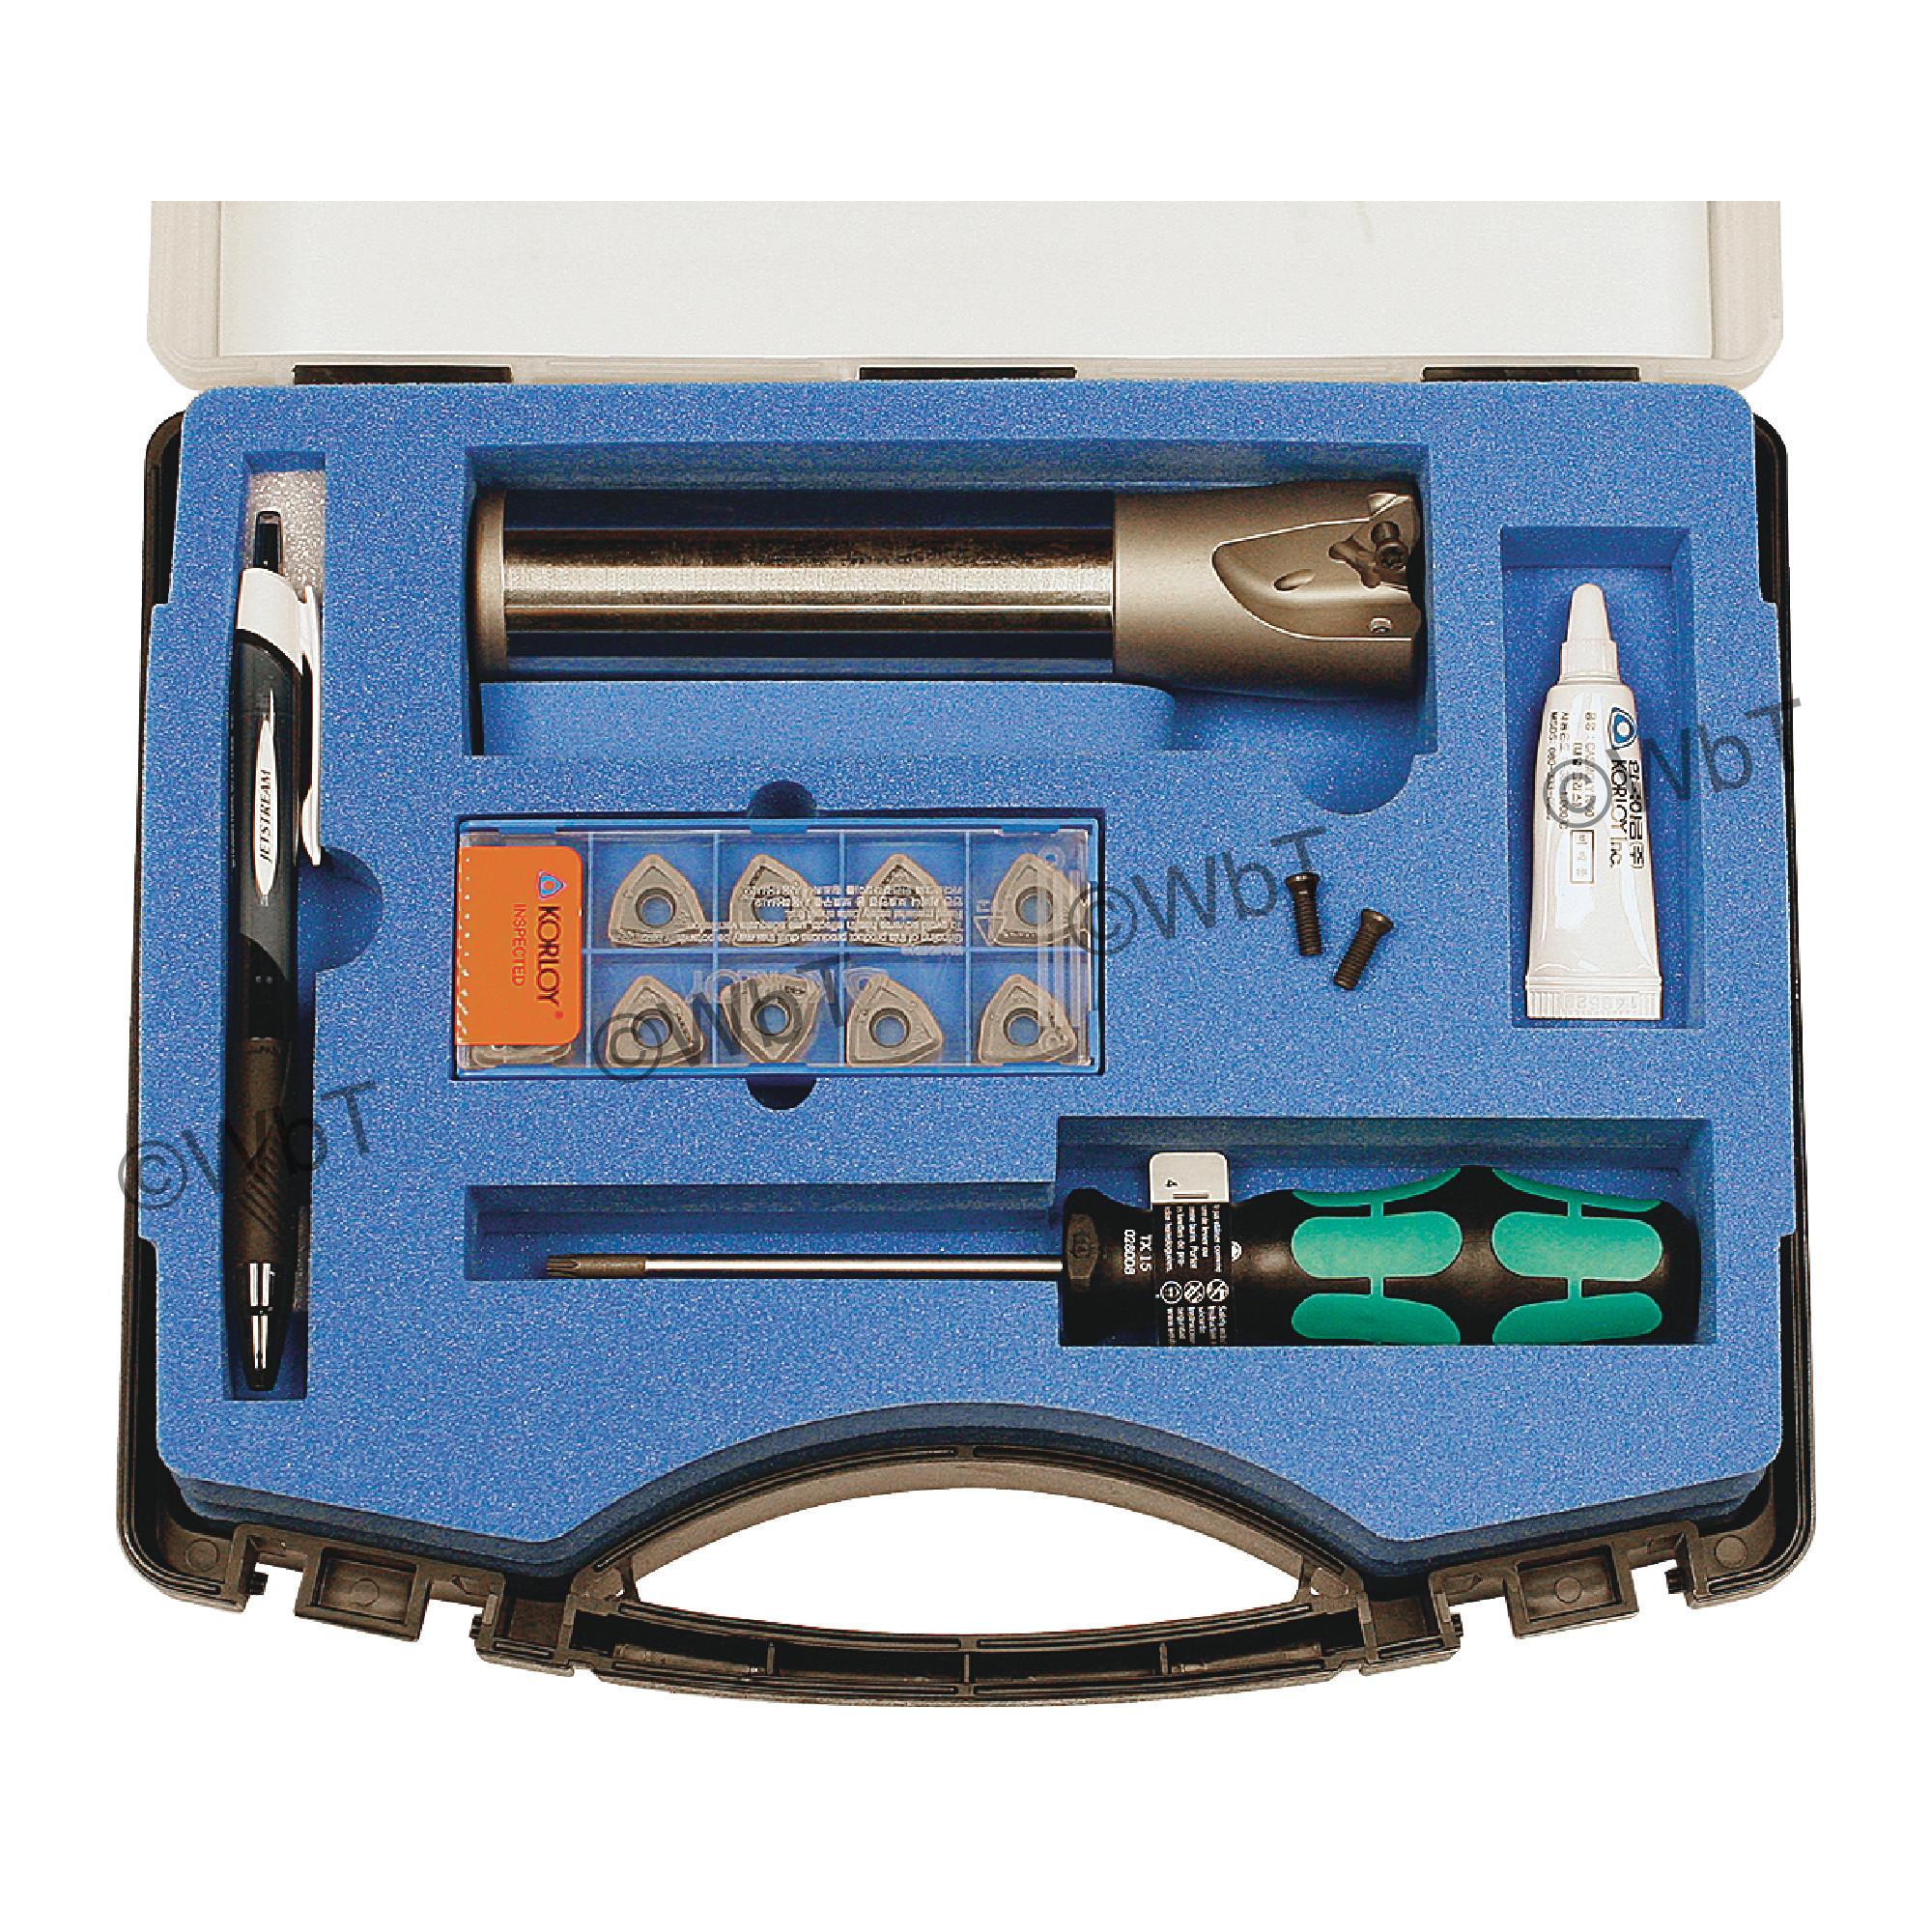 "KORLOY - 1.500"" High-Feed End Mill Set / Includes: (1) HRMDSA13150HR-3S125 (1.5"" ø) & (10) WNMX130520ZNN-MM PC530"